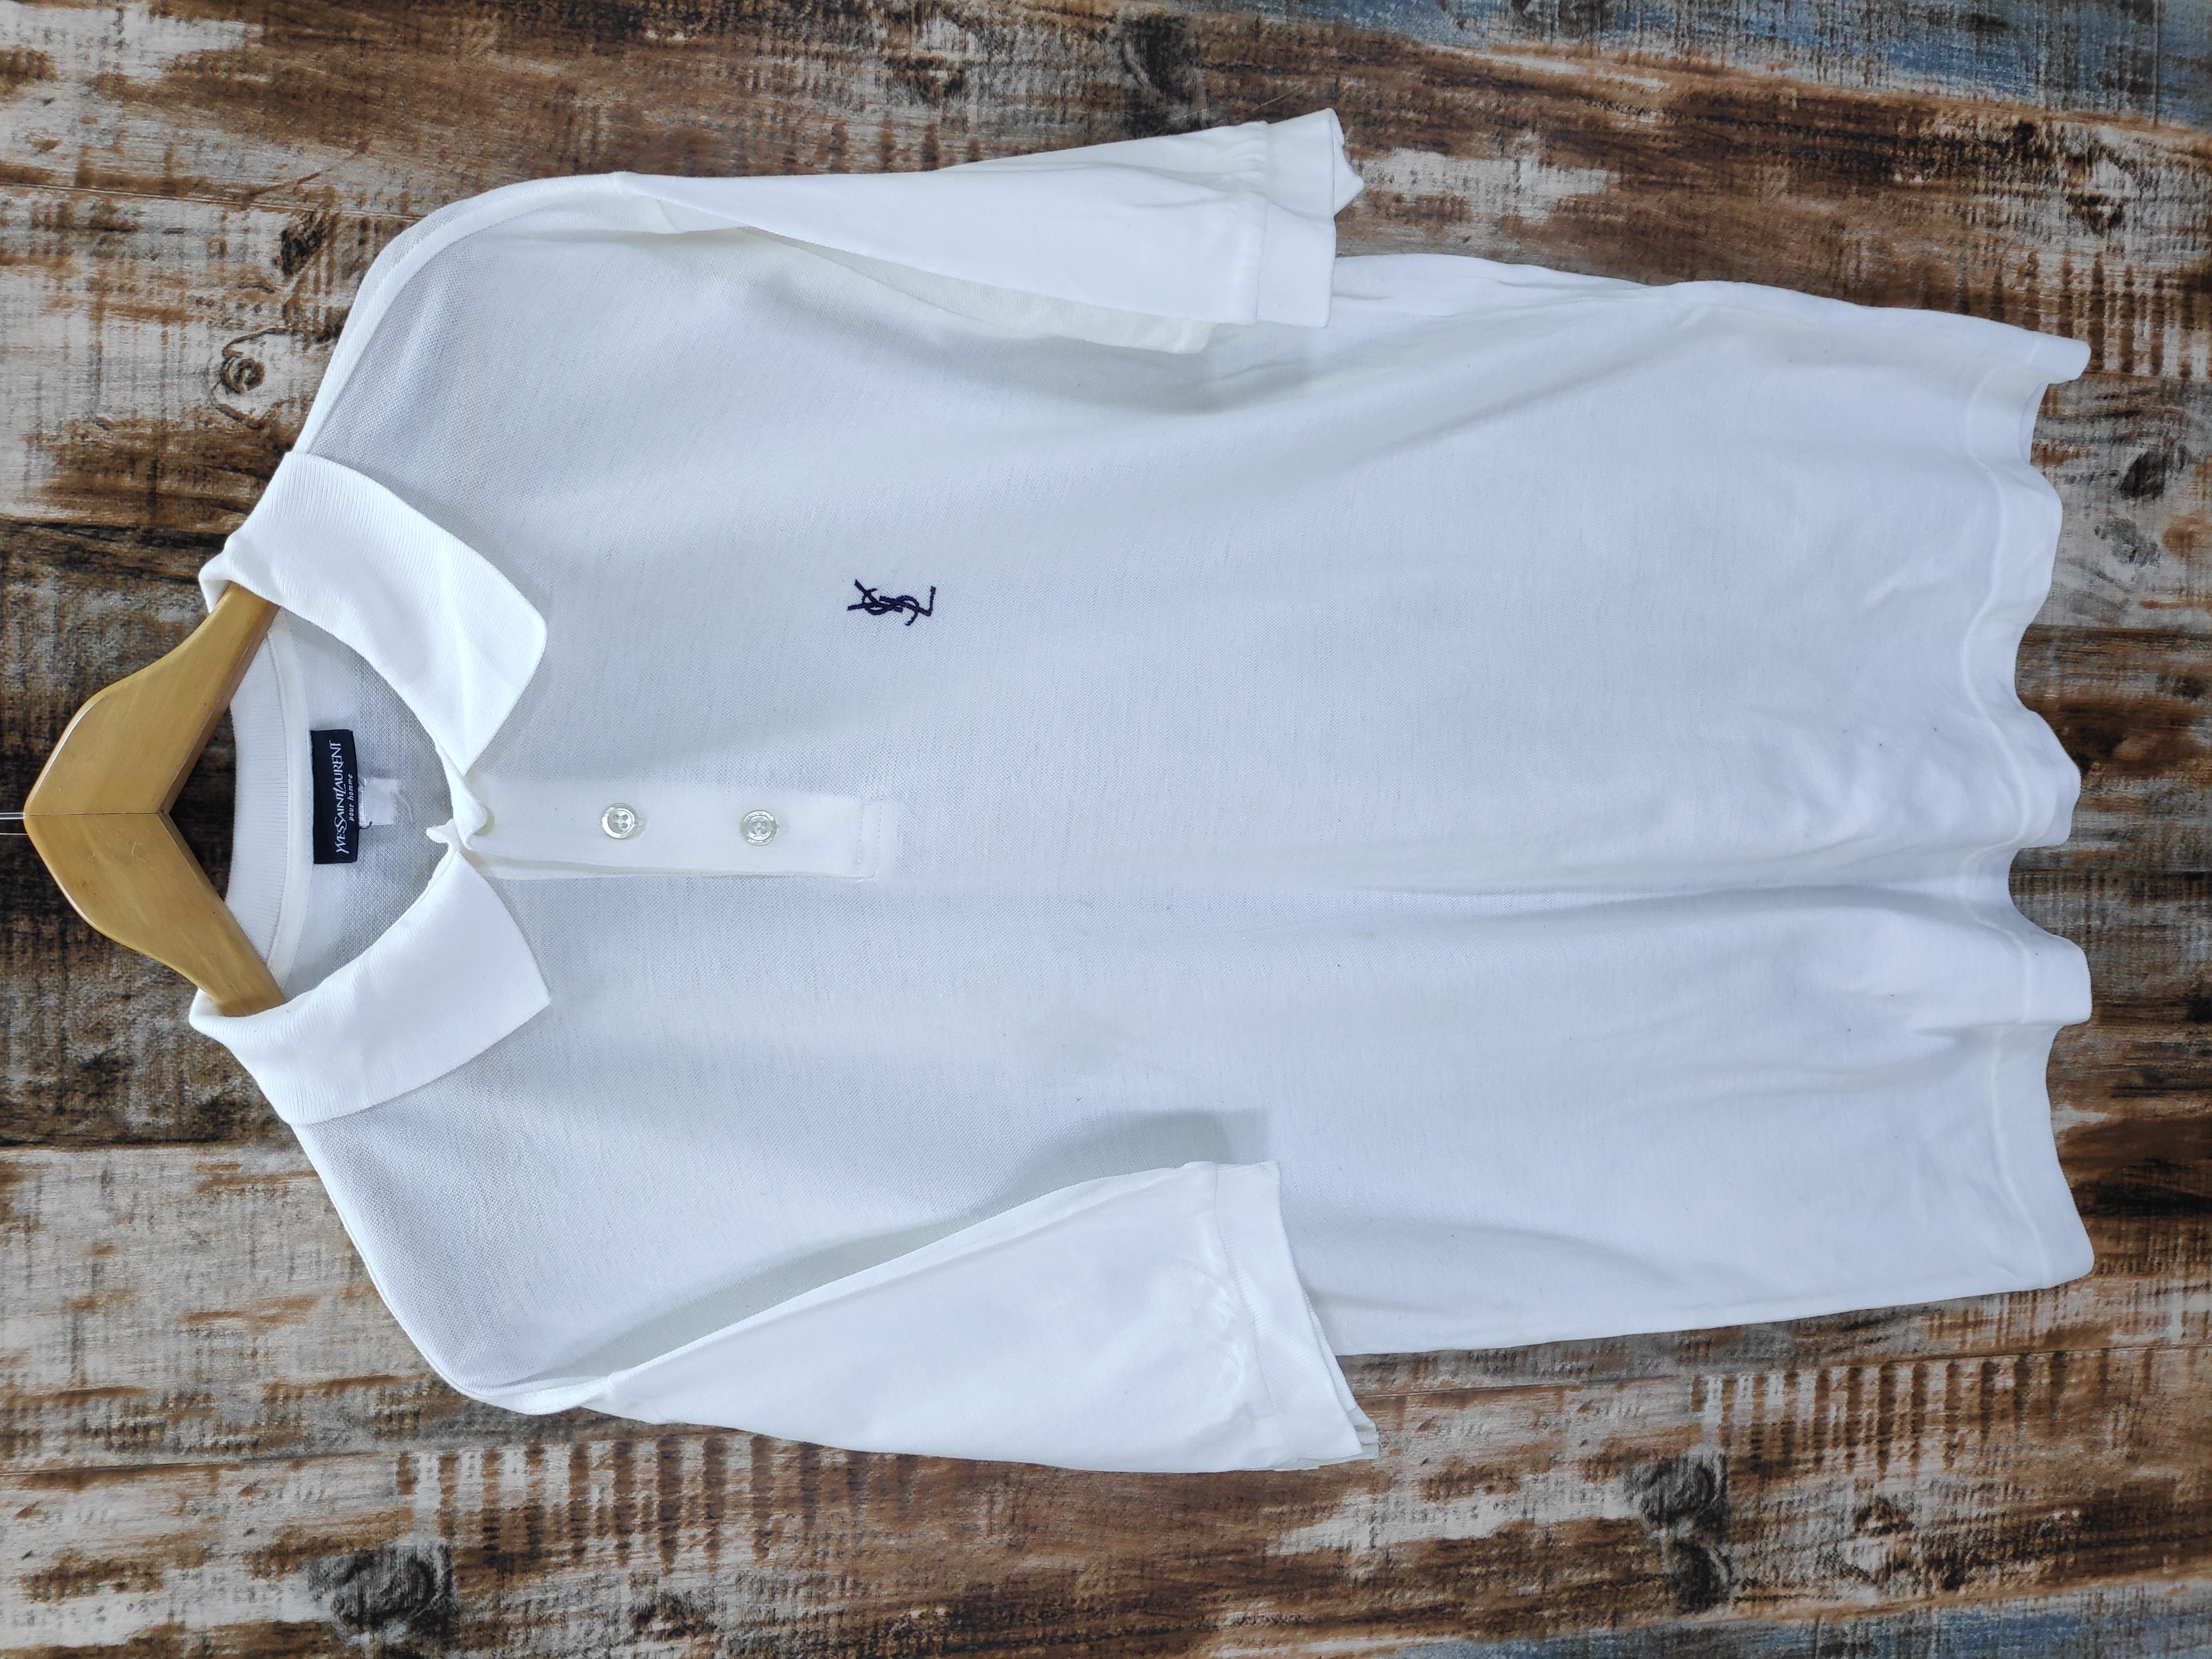 016e340dd78 Ysl Pour Homme Ysl Tricot 90s Ysl Yves Saint Laurent Polo Shirt Ysl White  Polo Shirt Ysl Italy | Grailed